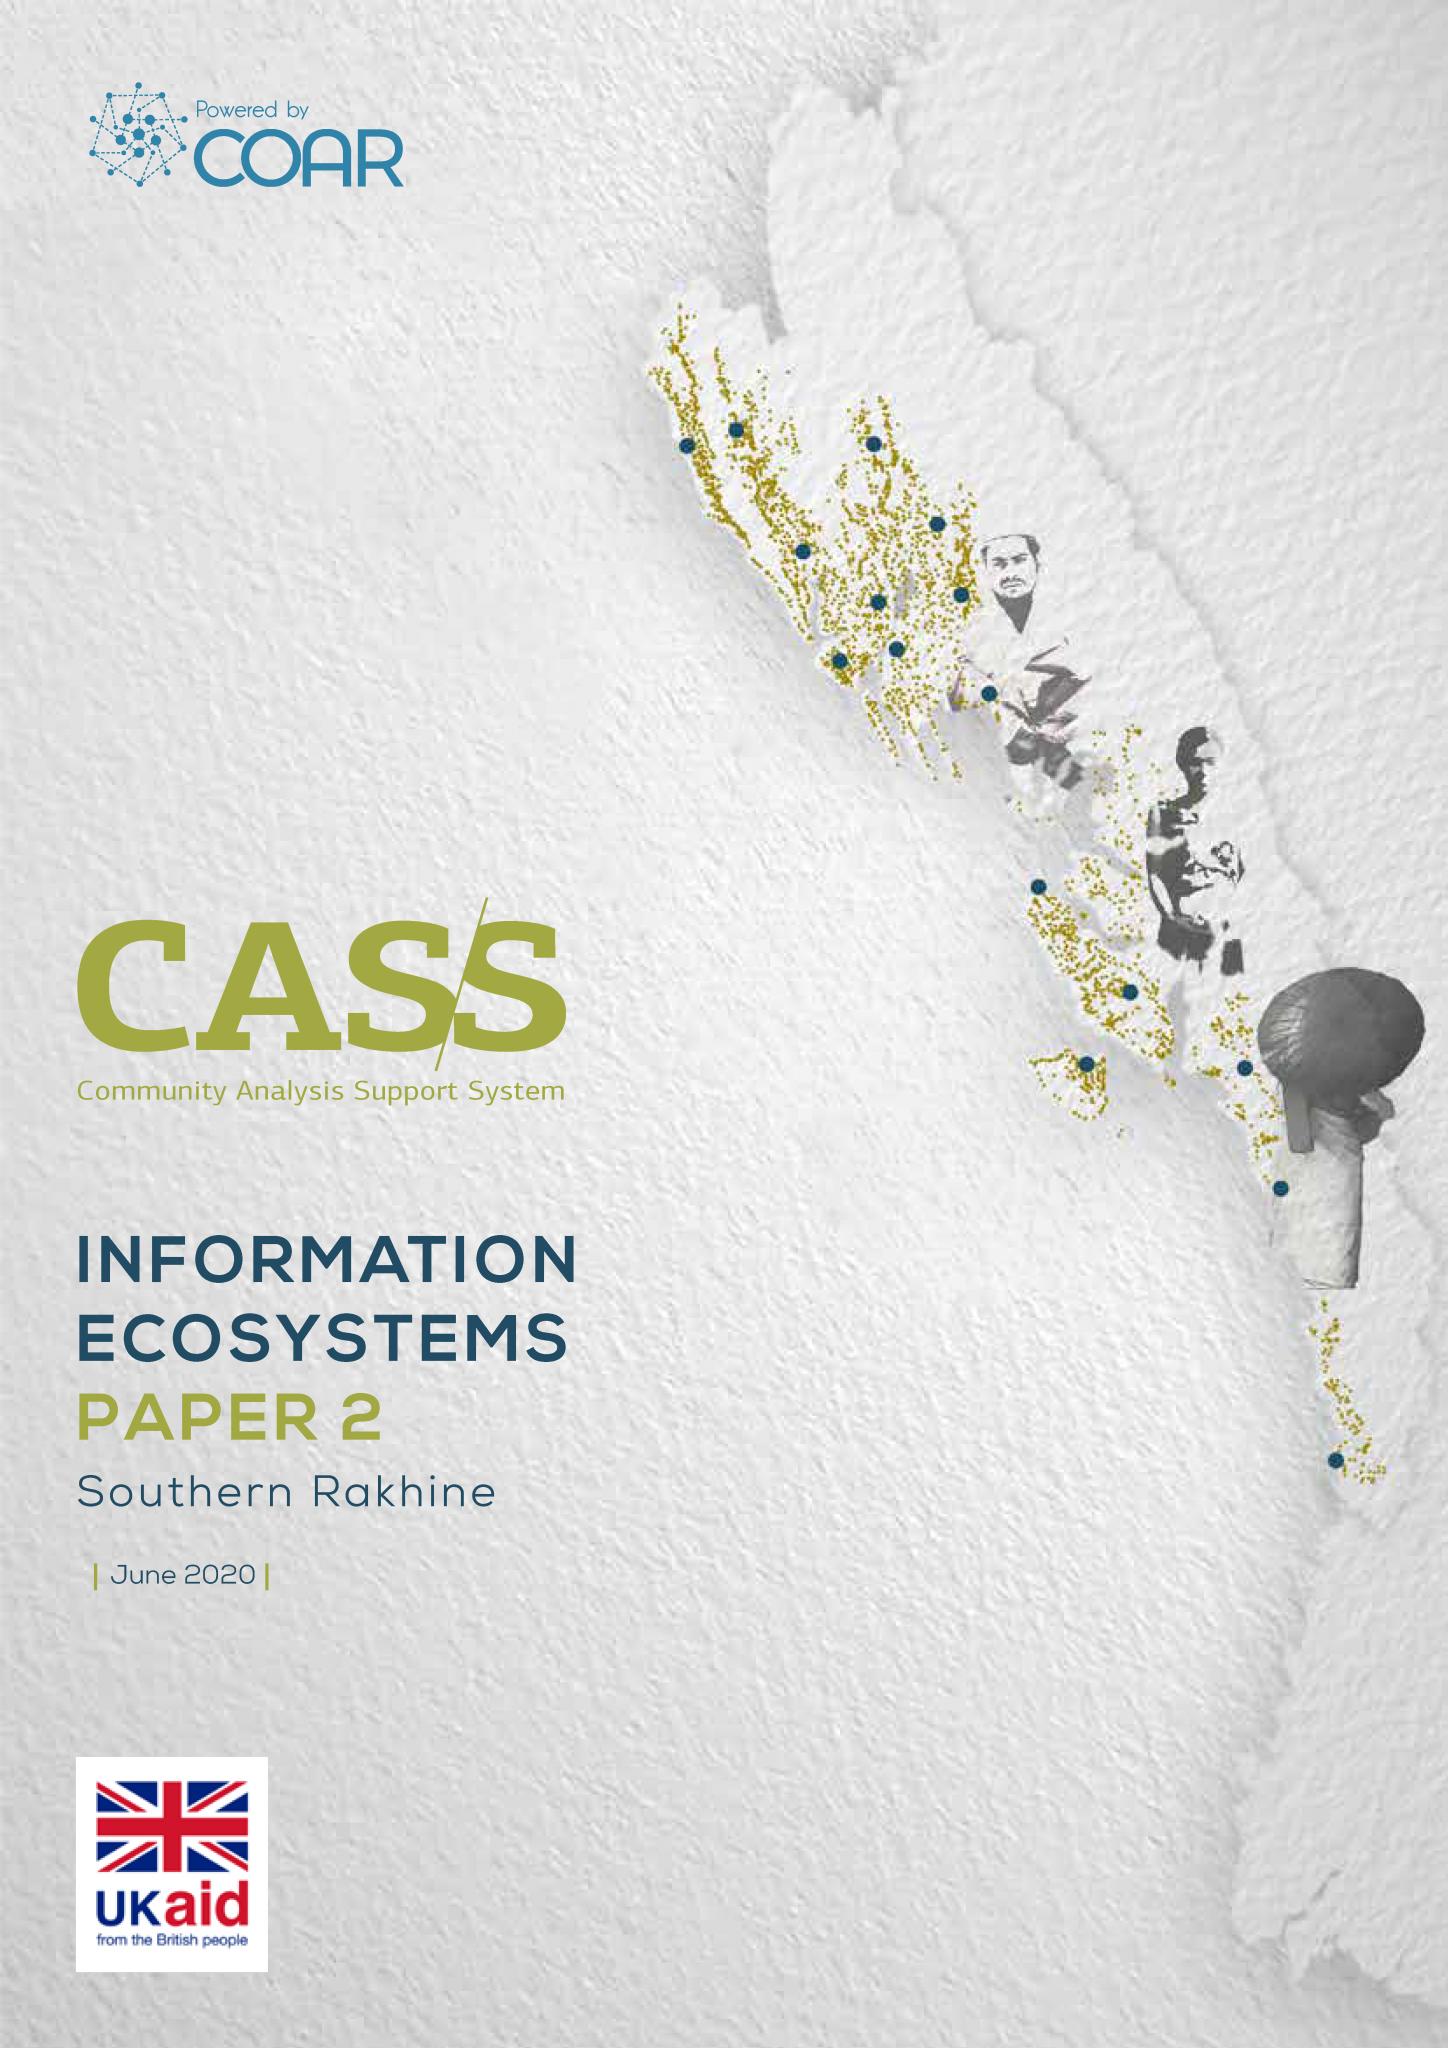 Information Ecosystems Paper 2: southern Rakhine